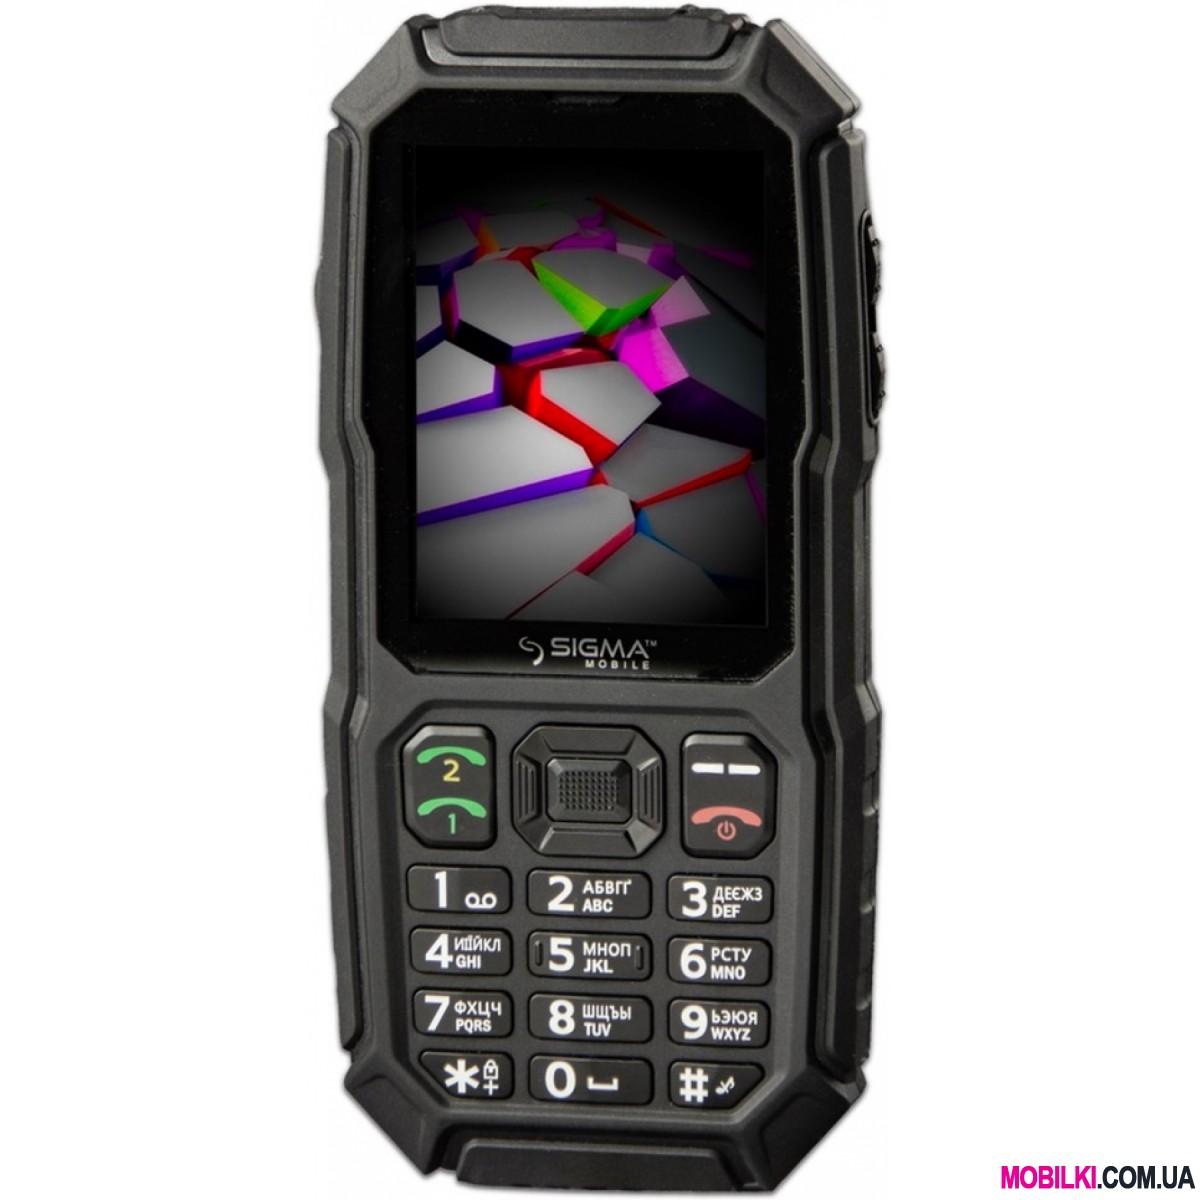 Sigma mobile X-treme ST68